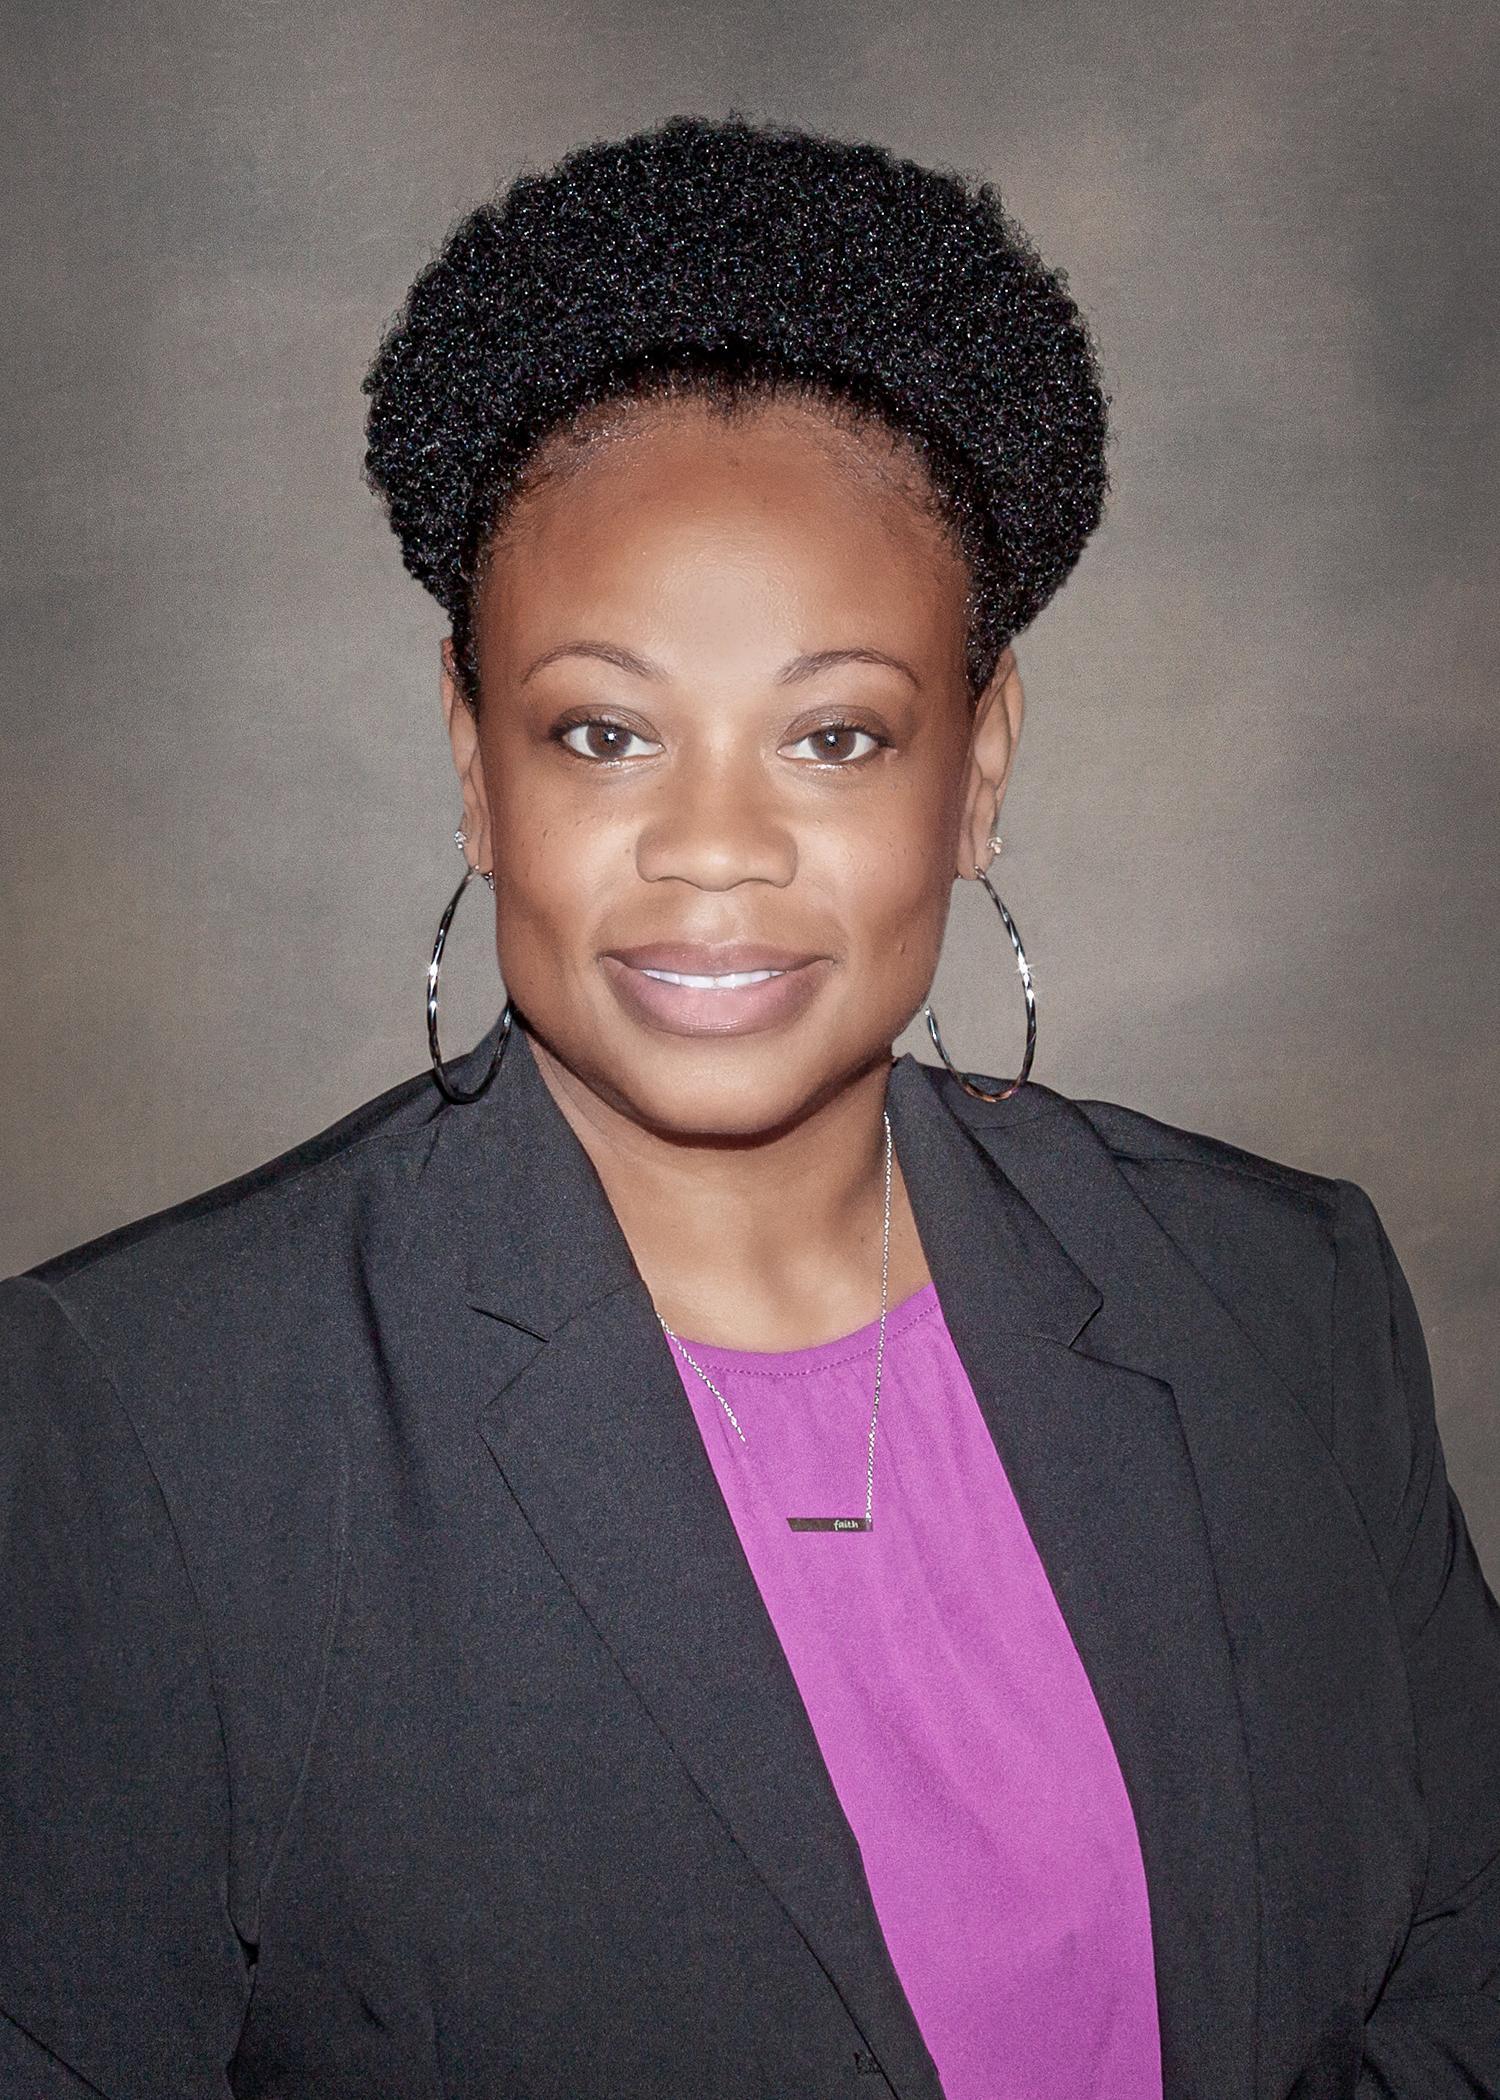 Ms. Gorham, Principal